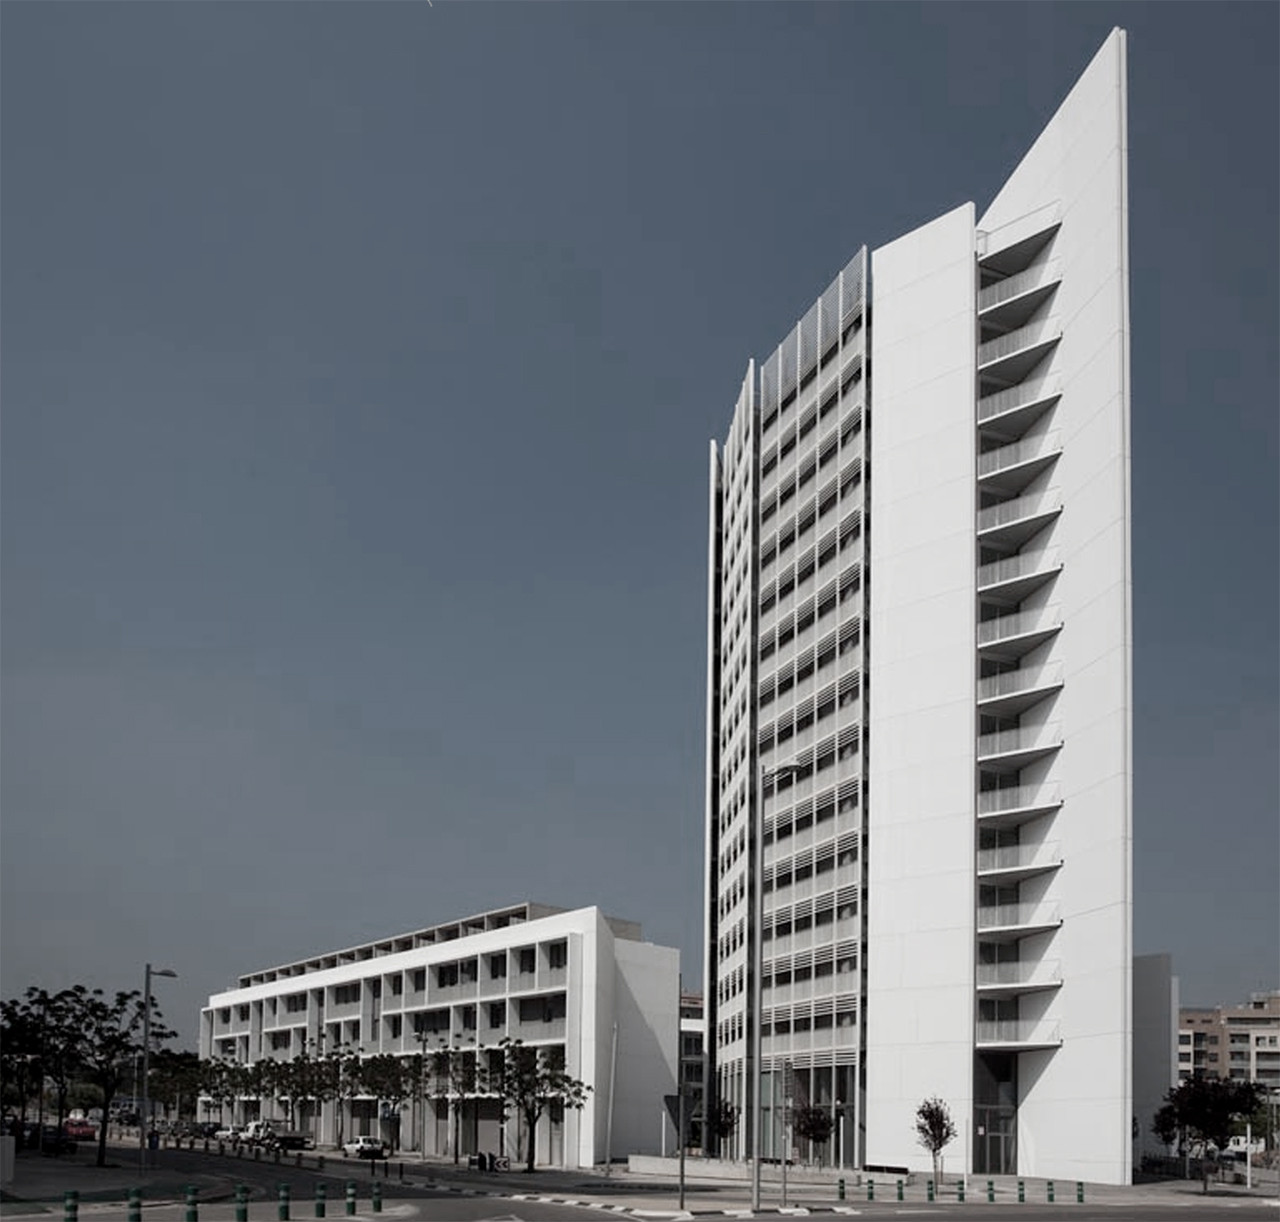 Parc Central Social Housing Building / OAB + Peñín Architects, © Diego Opazo